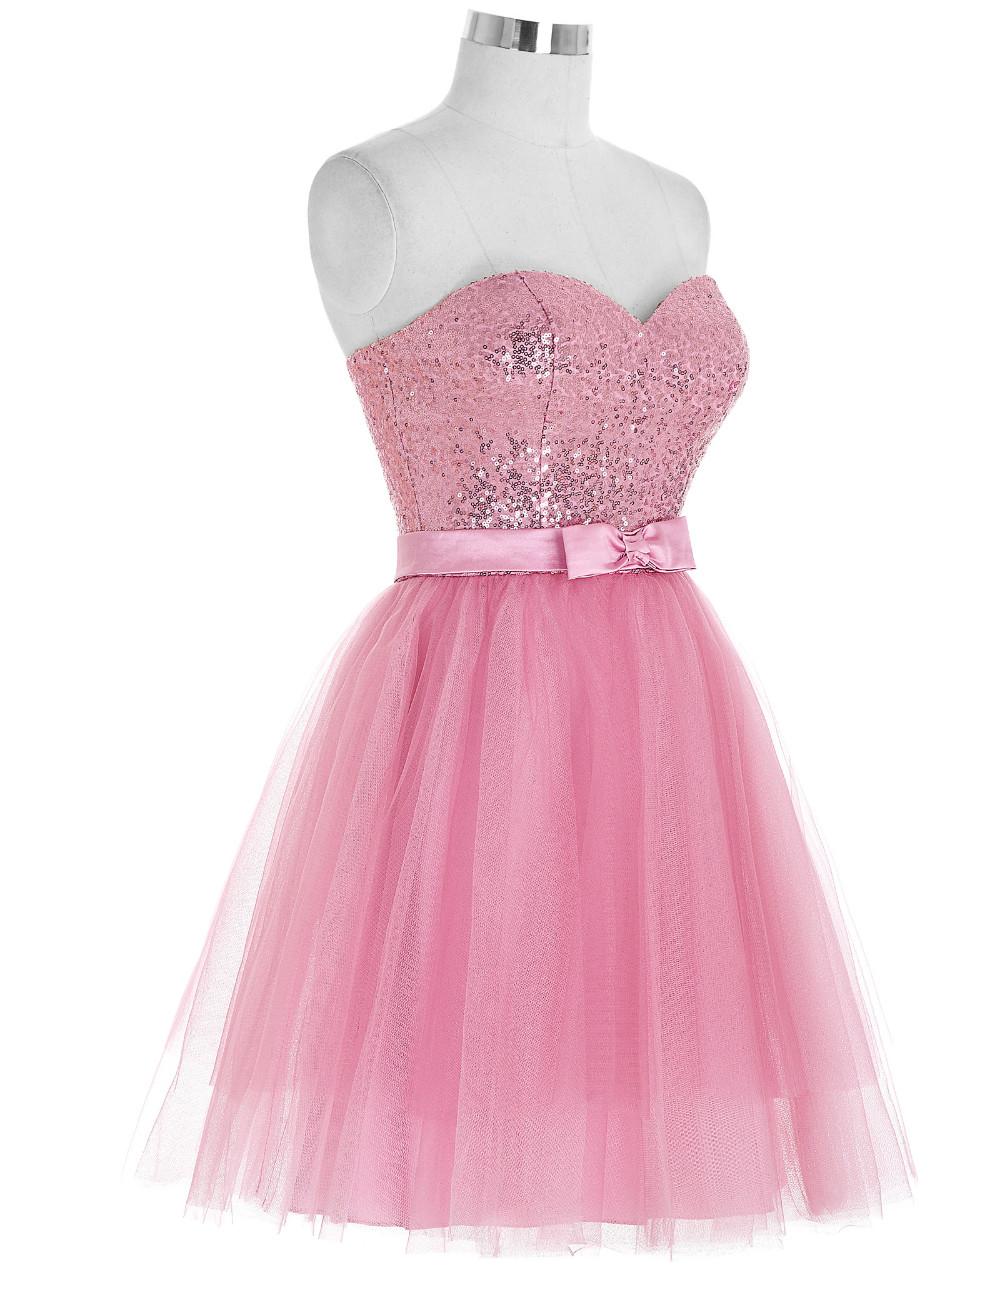 55bda940ad Elegant Sweetheart Chiffon Evening Dresses Long Formal Gown 2017 Lace-up  Back Party Dresses Orange Evening Dress Robe De SoireeUSD 48.58 piece